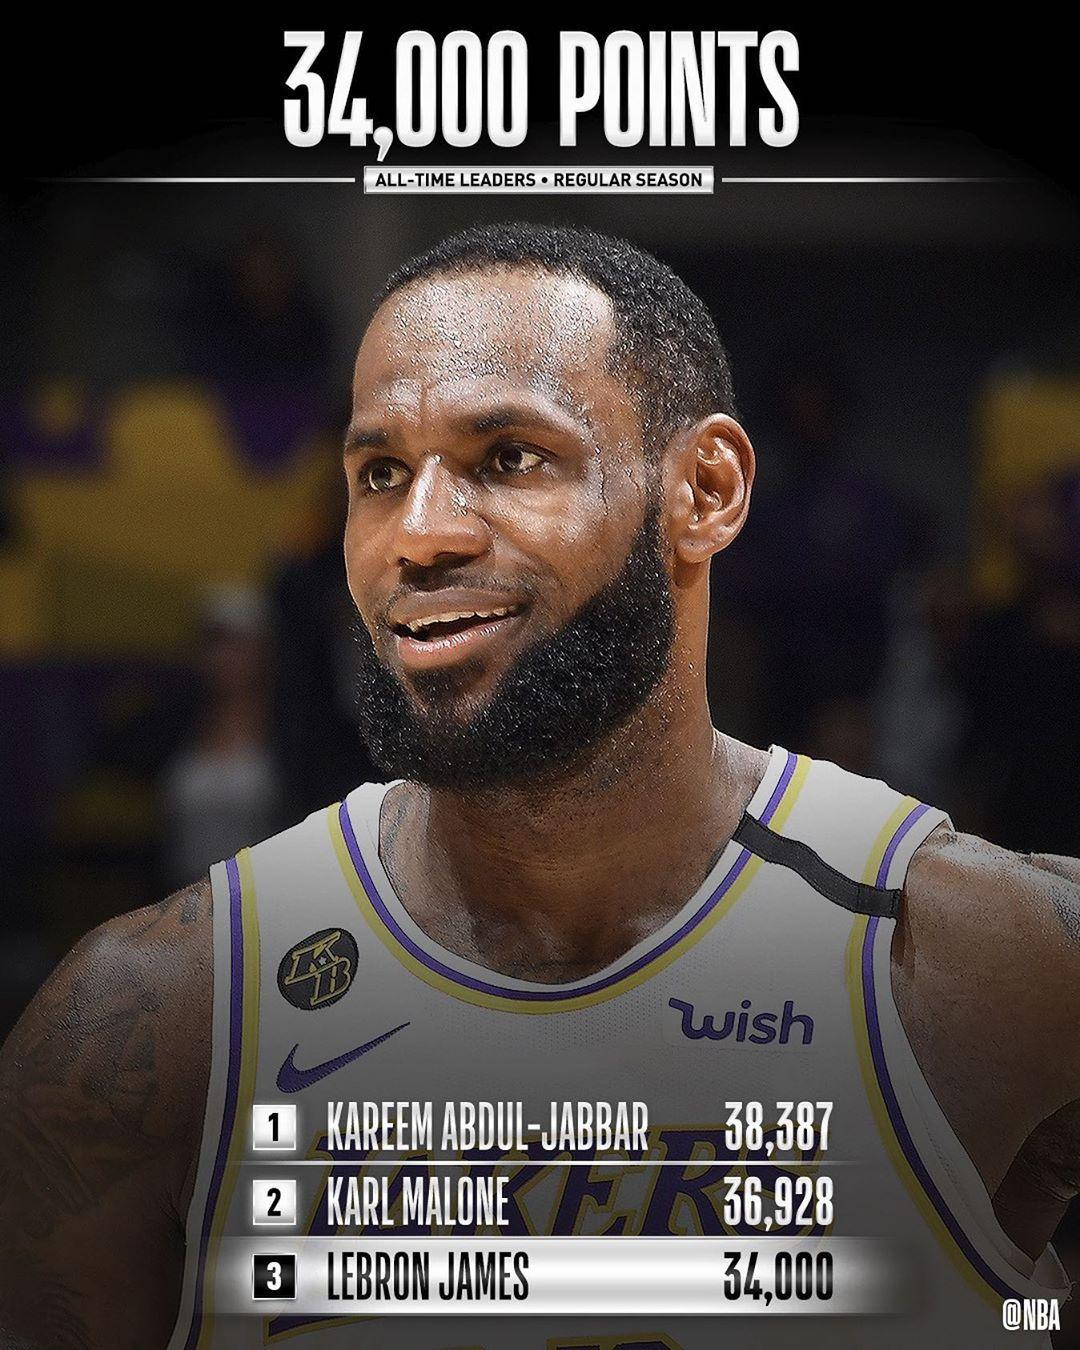 NBA官方:祝贺詹姆斯成为历史第3位34000分先生